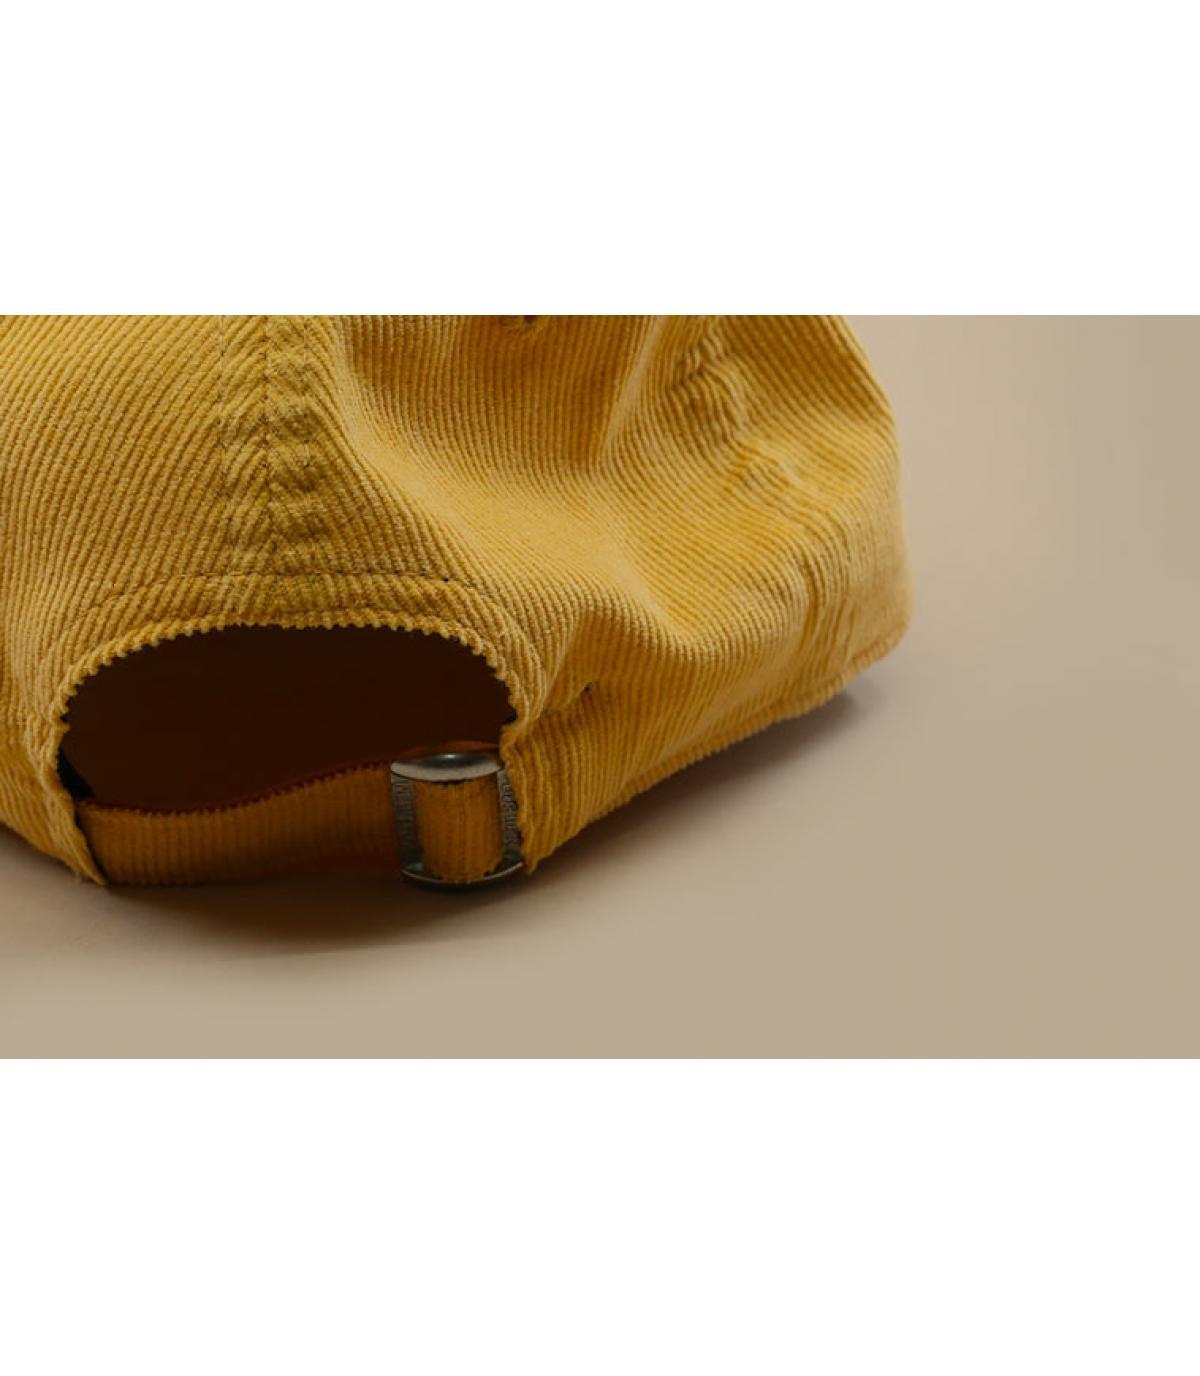 Details Cord Pack 940 NY mellow yellow black - Abbildung 5